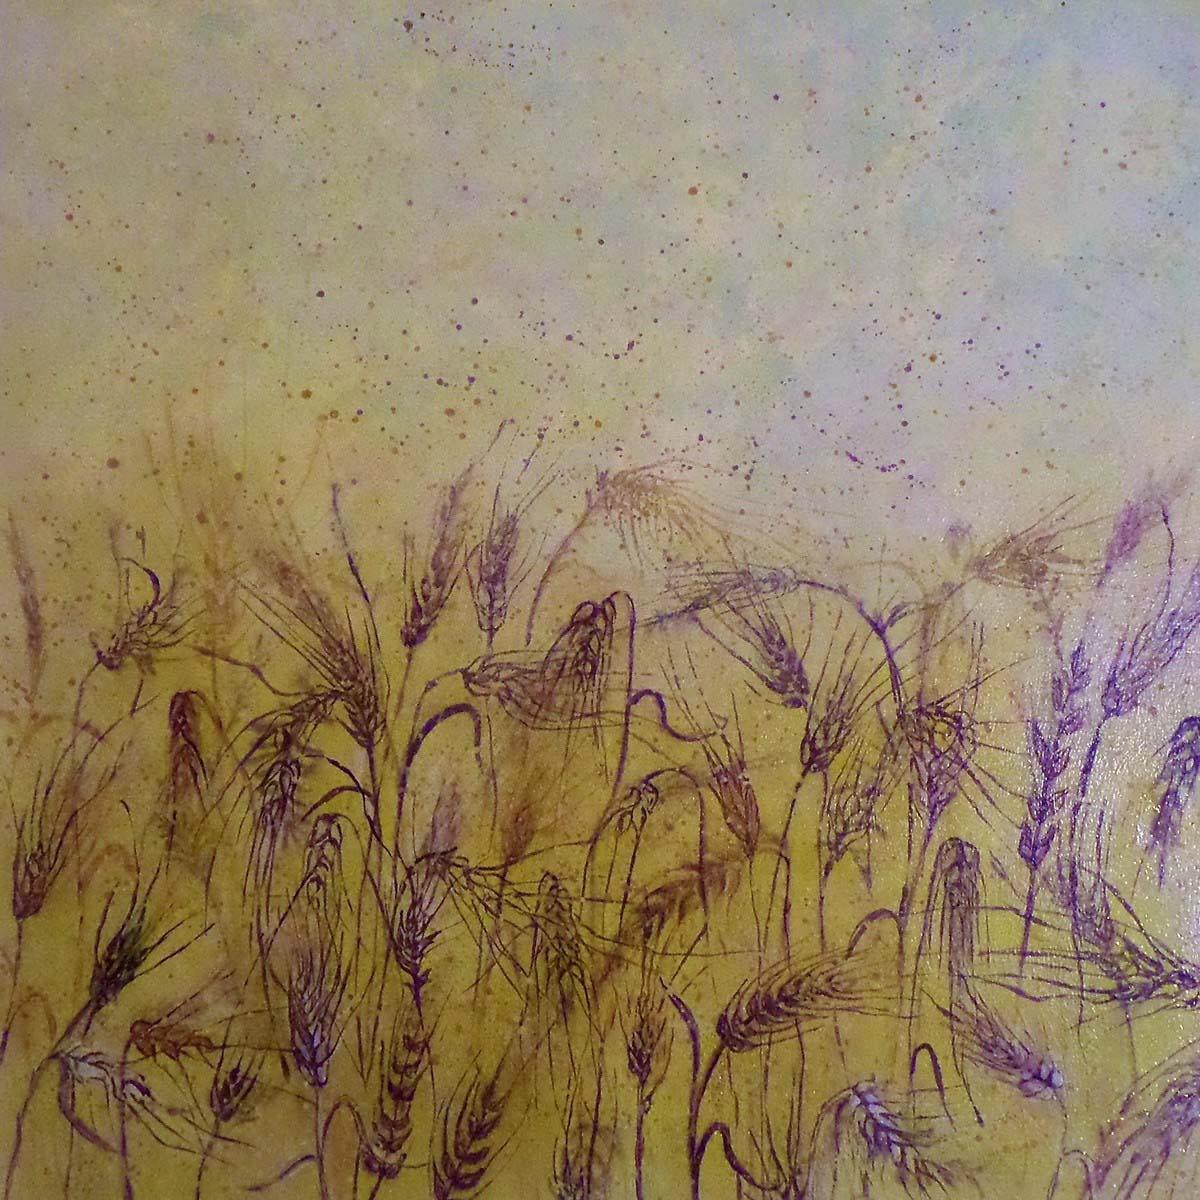 Purple Snow - Golden Wheat Field Magic copy